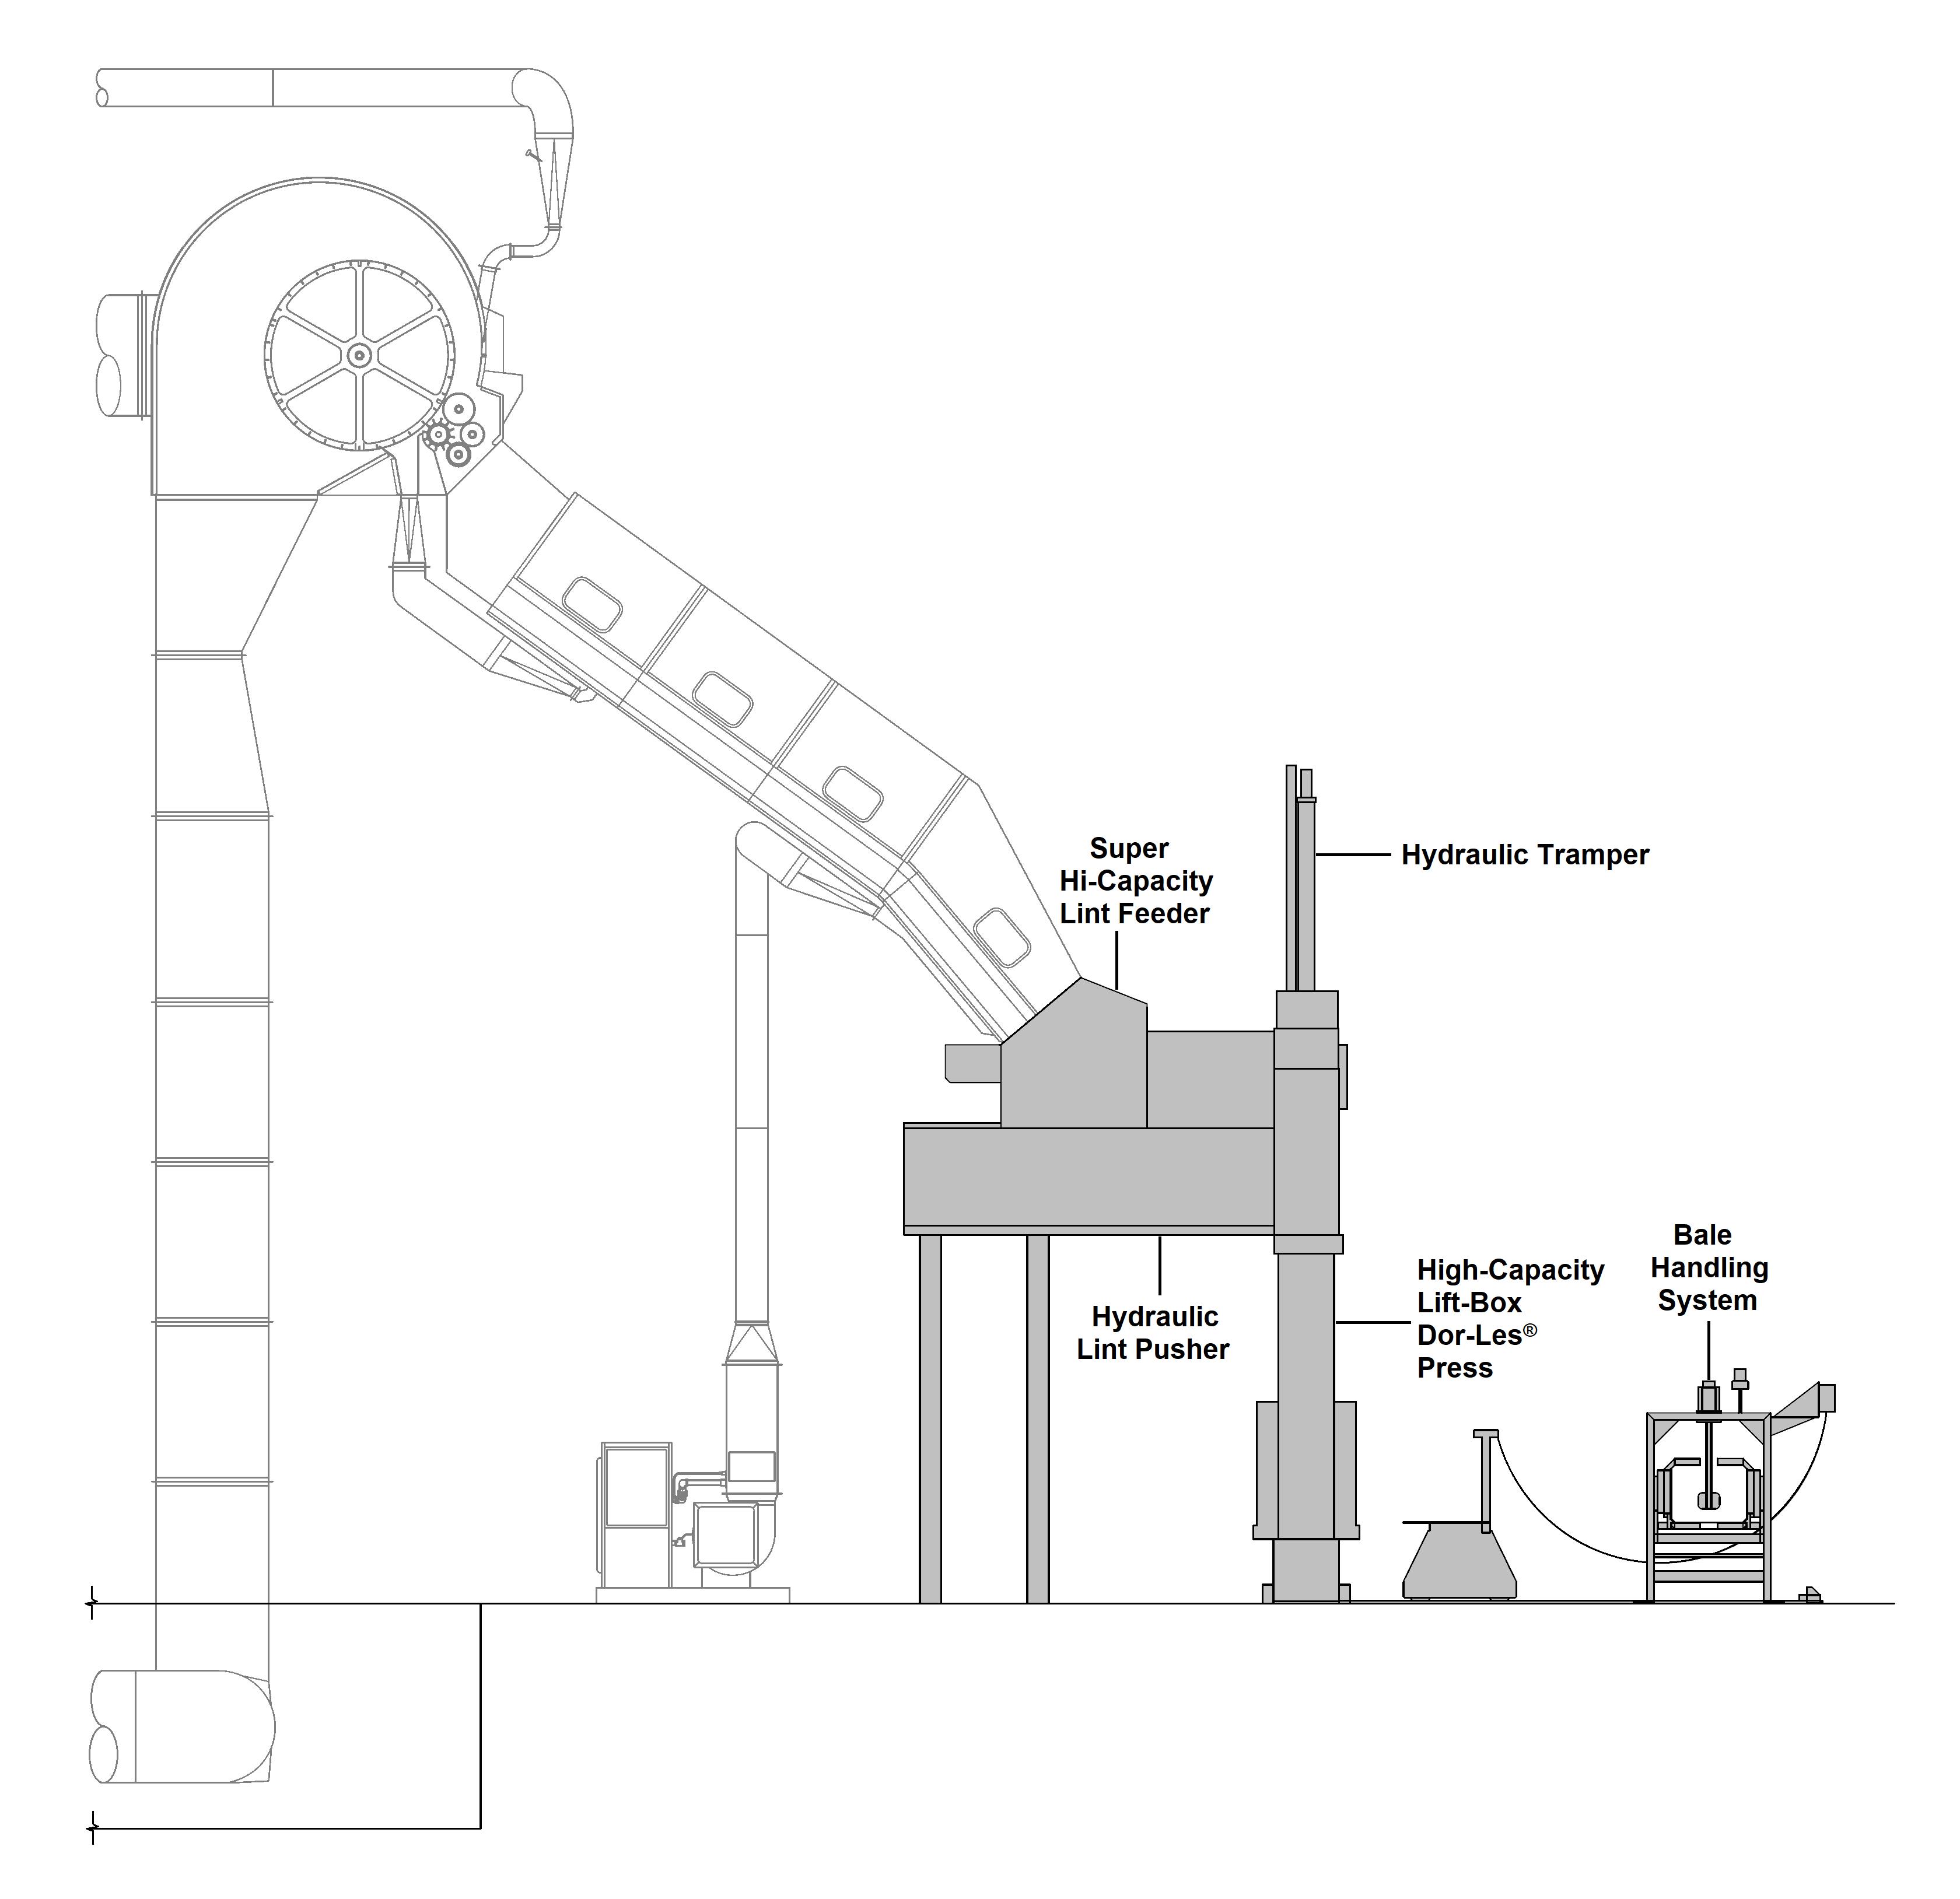 Pressing & Bale Handling System (Lift-Box)